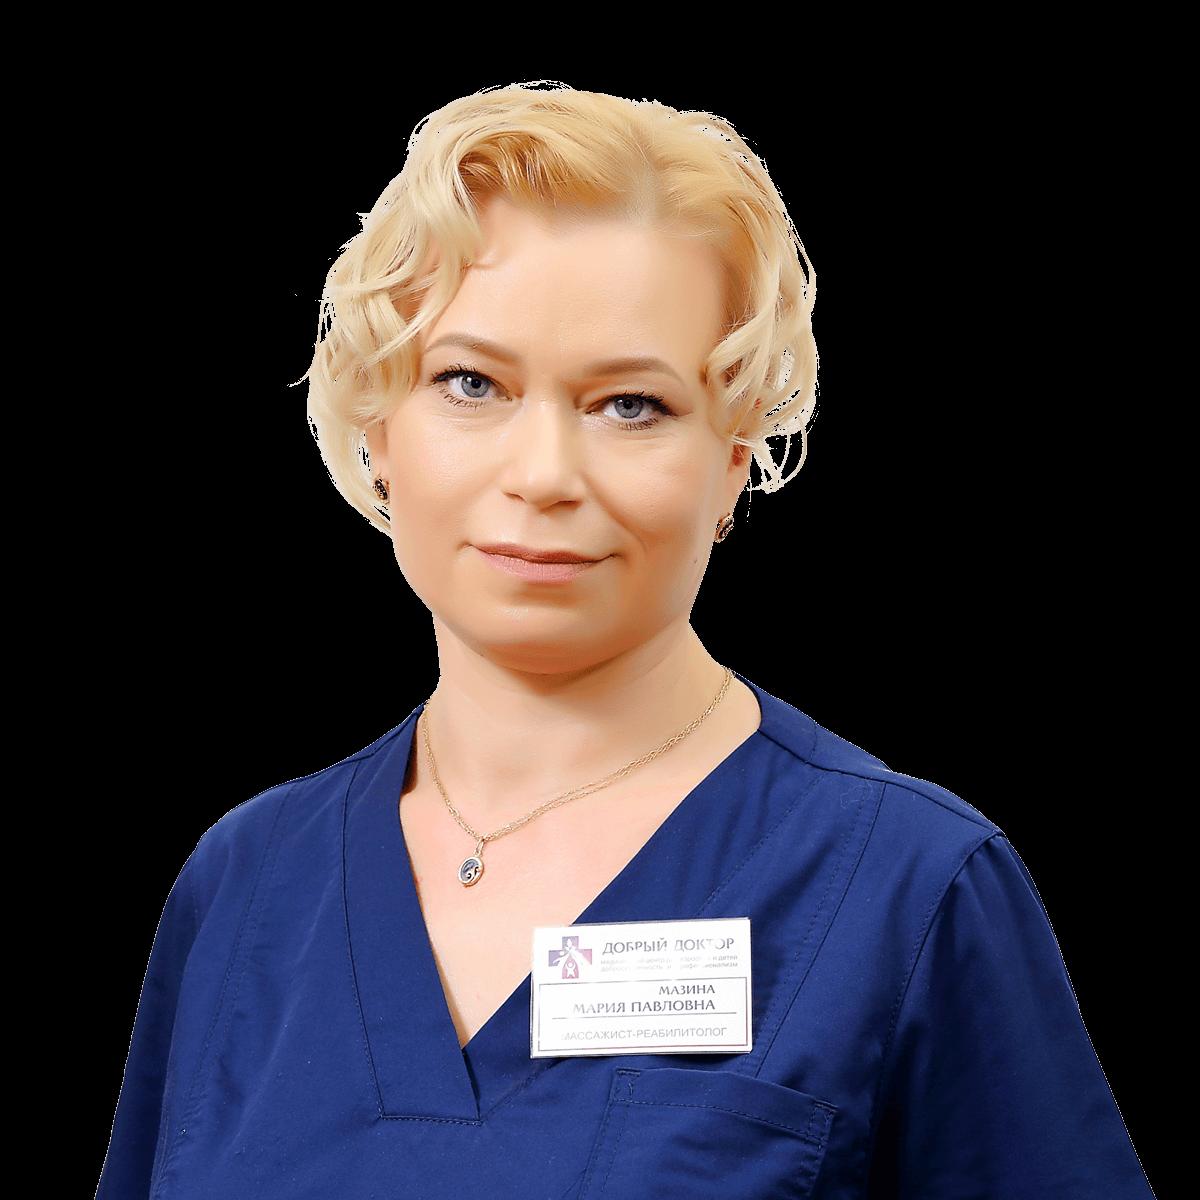 Мазина Мария Павловна